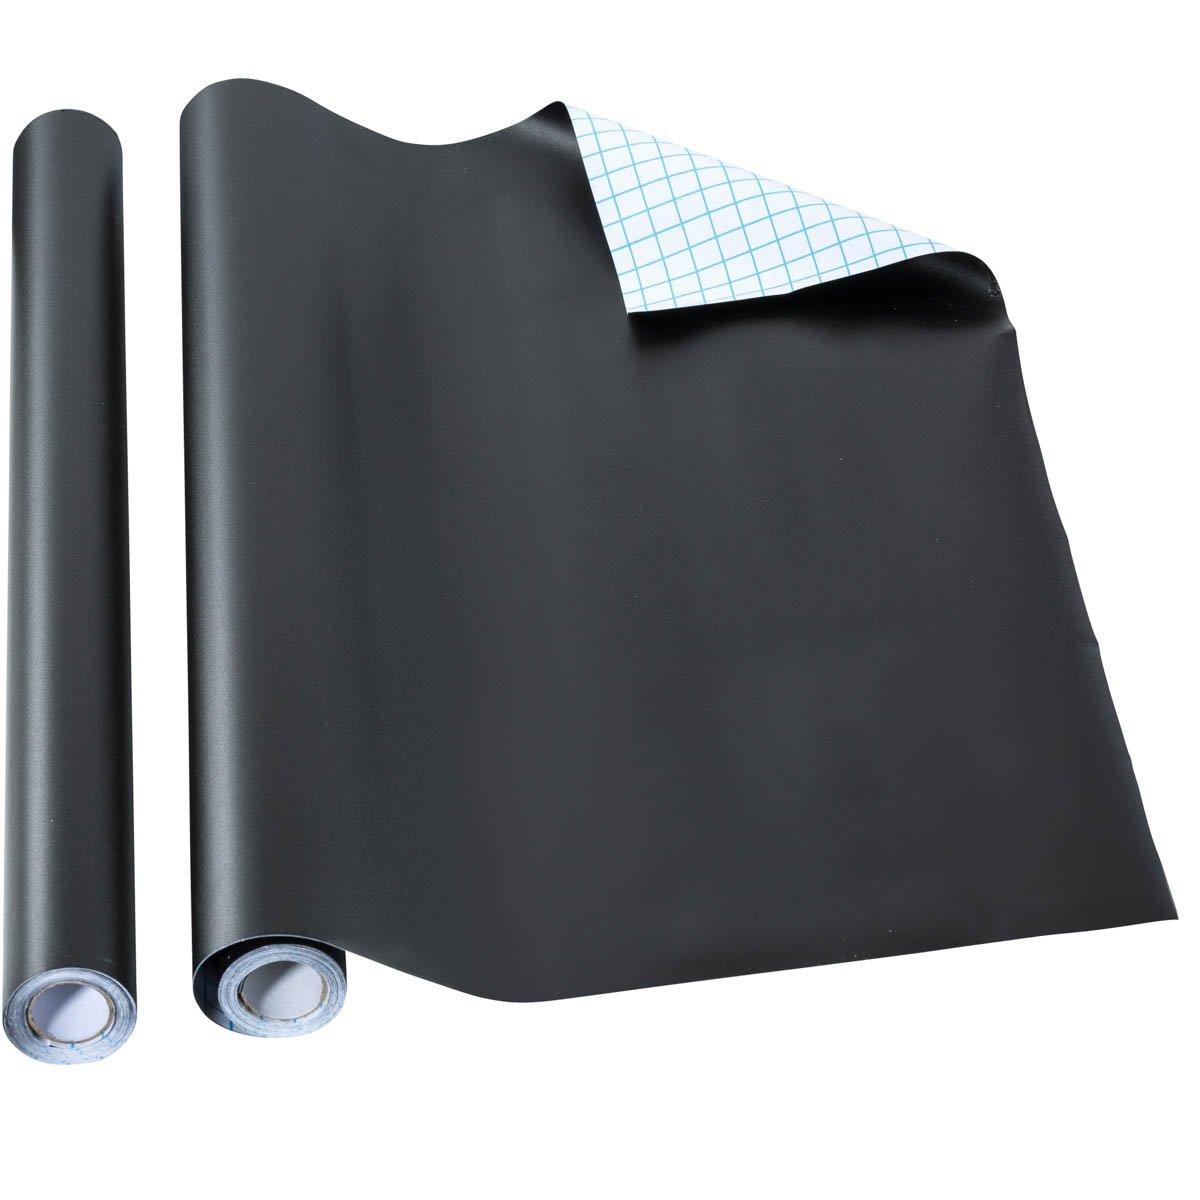 SimpleLife4U Solid Black Wood Grain Contact Paper Self Adhesive Shelf Liner  Door Countertop Cabinet Sticker 17.7